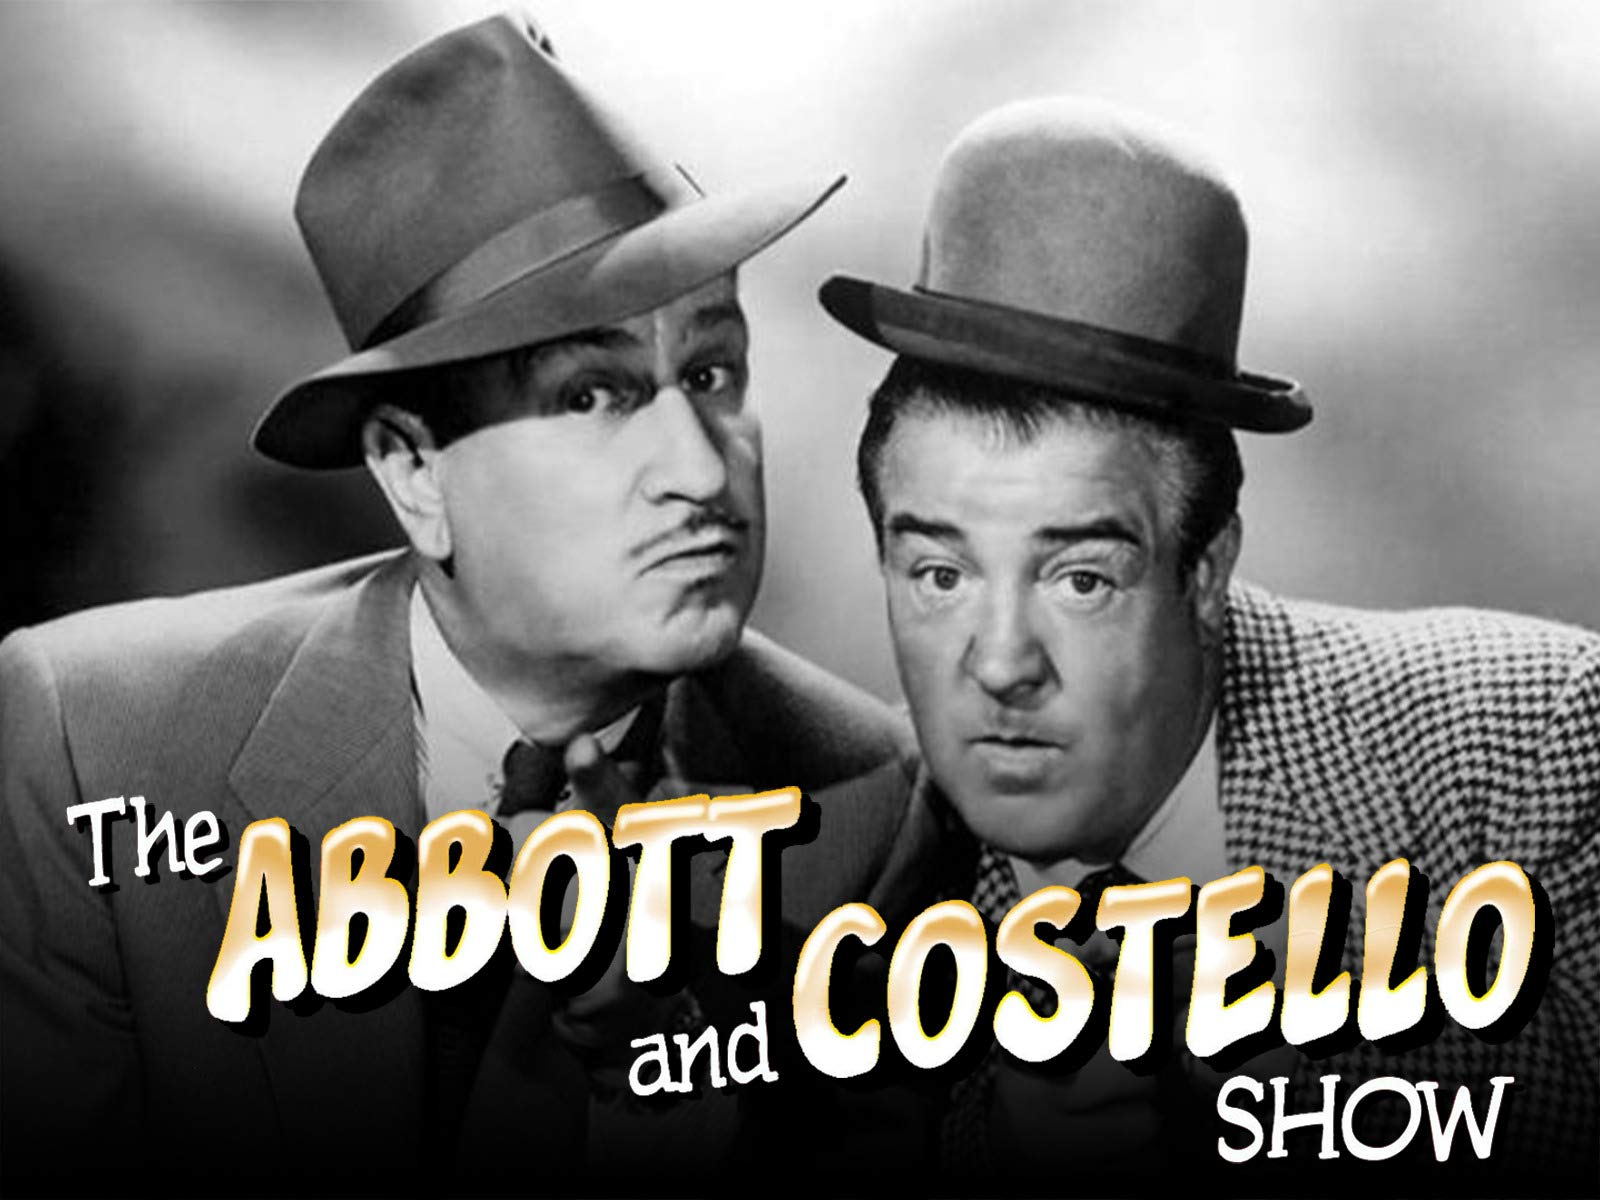 The Abbott and Costello Show - Season 1